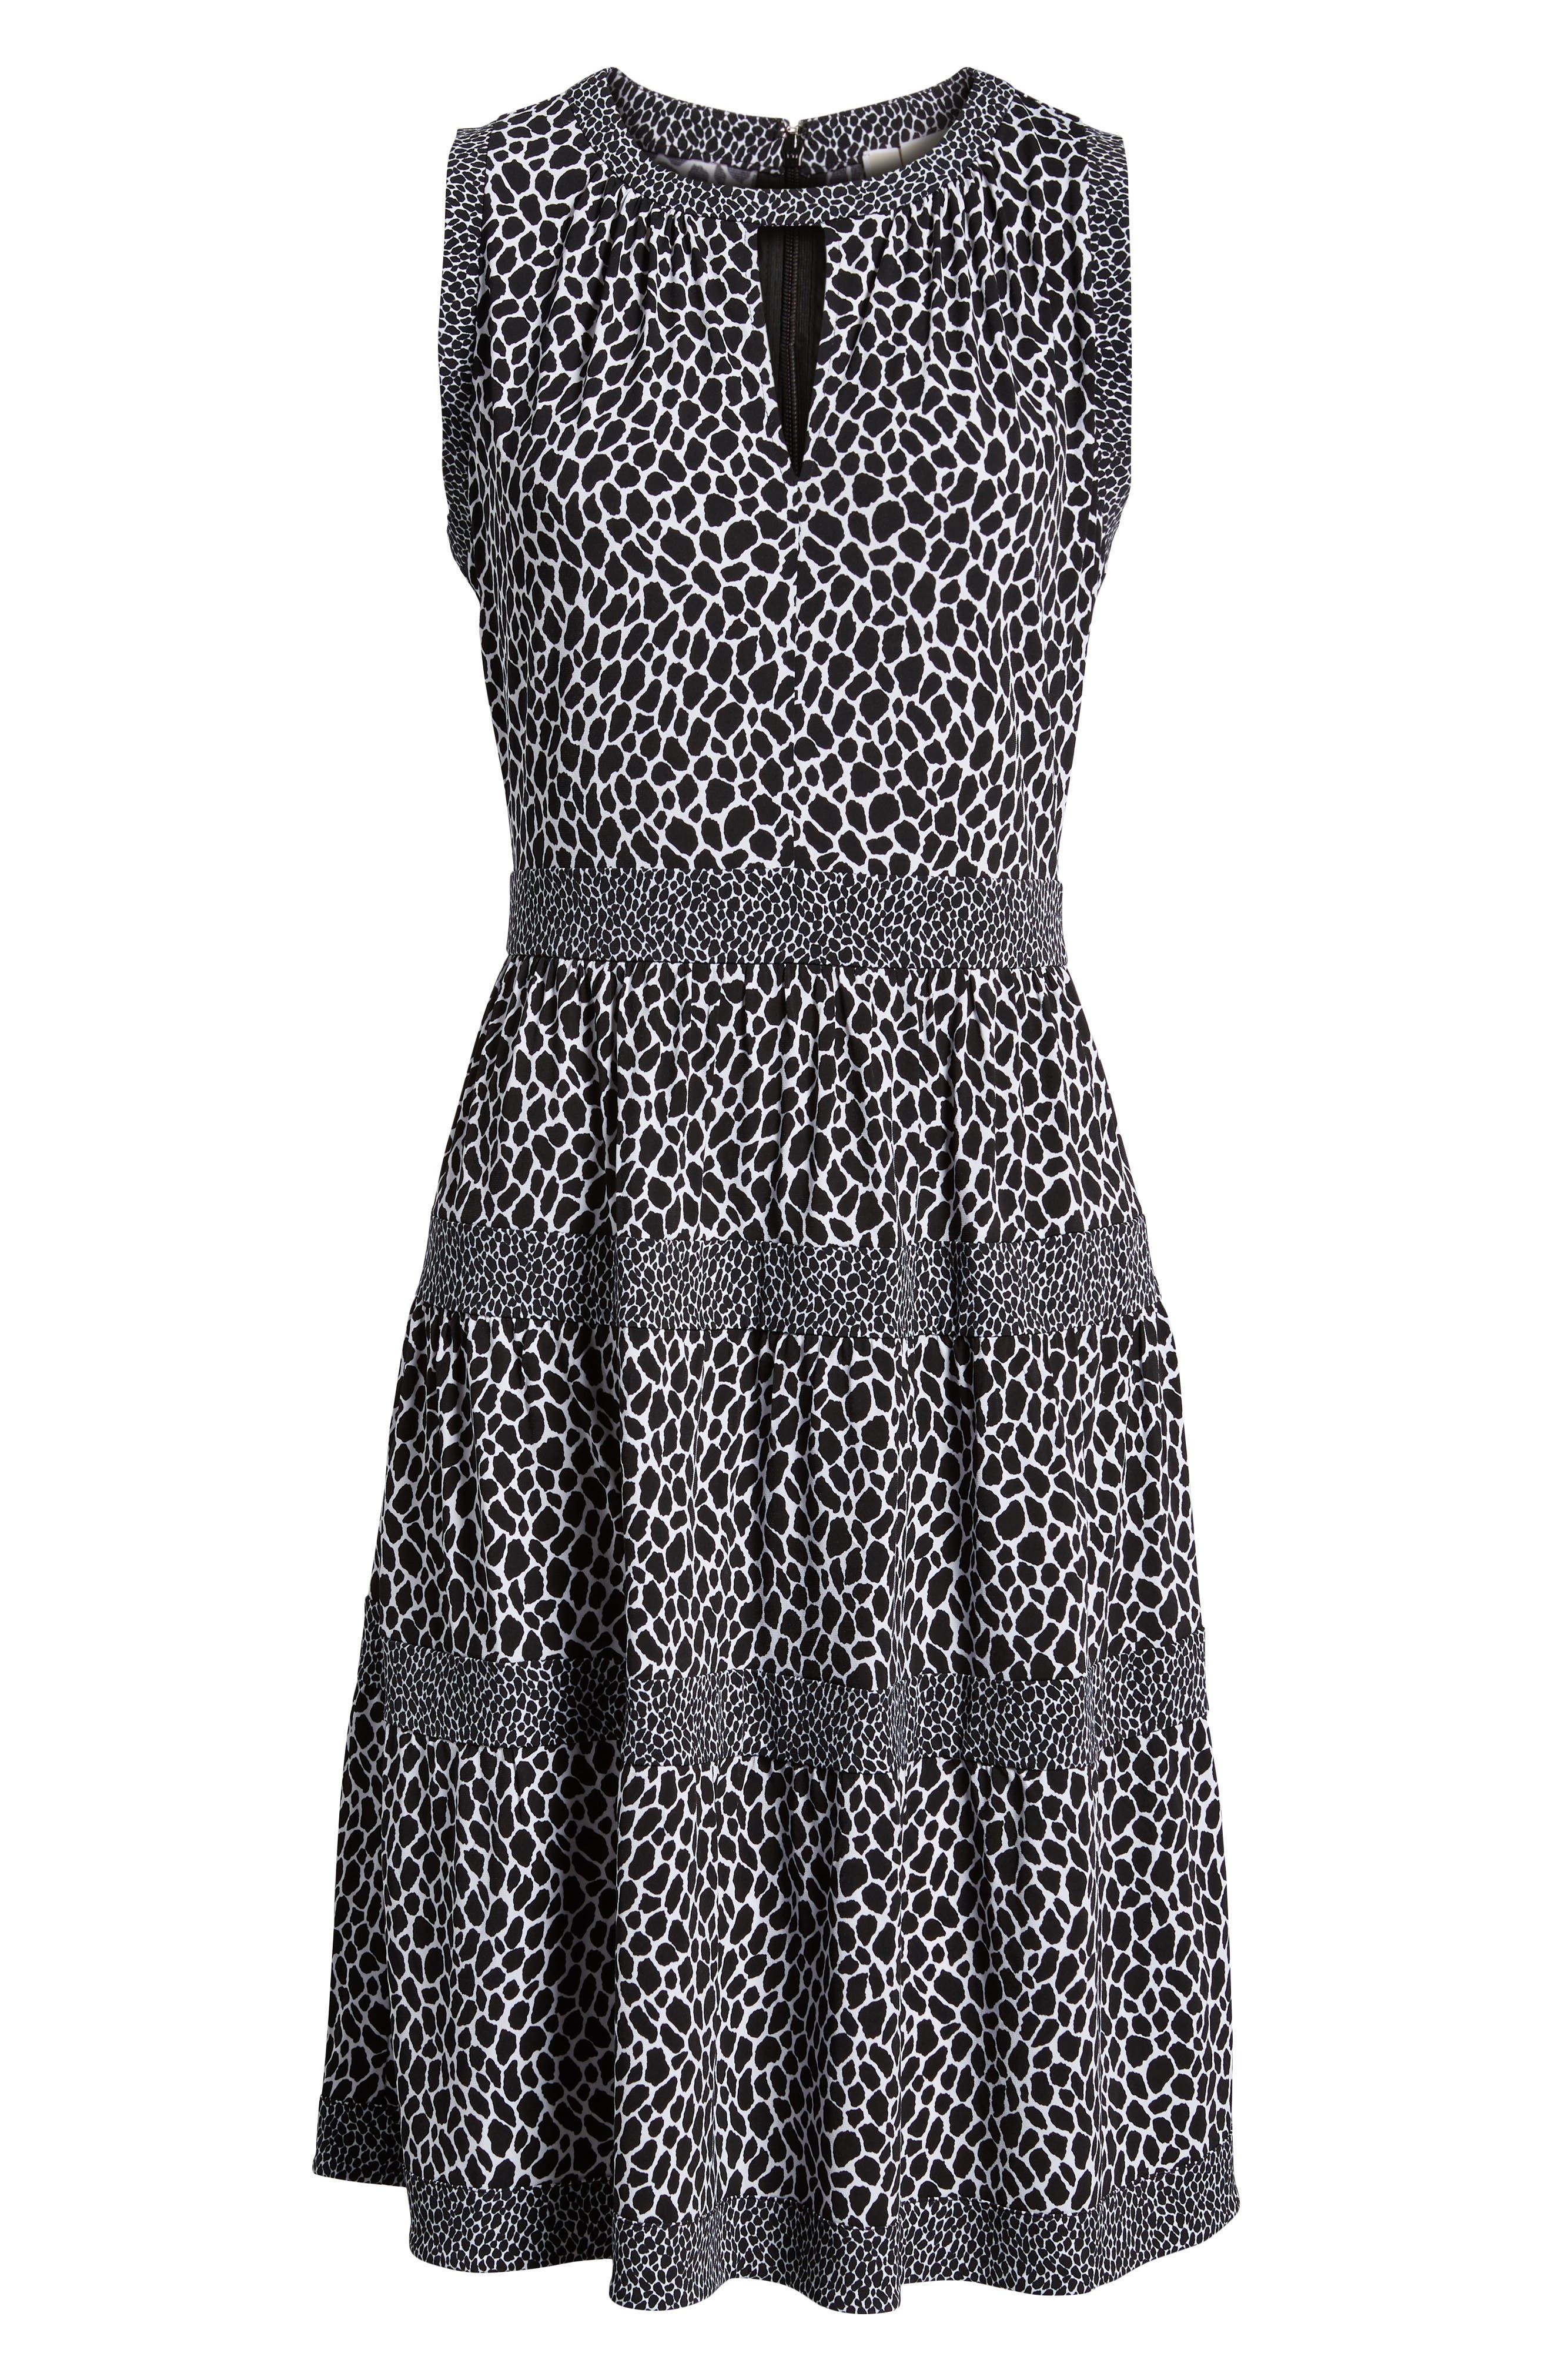 Sleeveless Leopard Border Fit & Flare Dress,                             Alternate thumbnail 7, color,